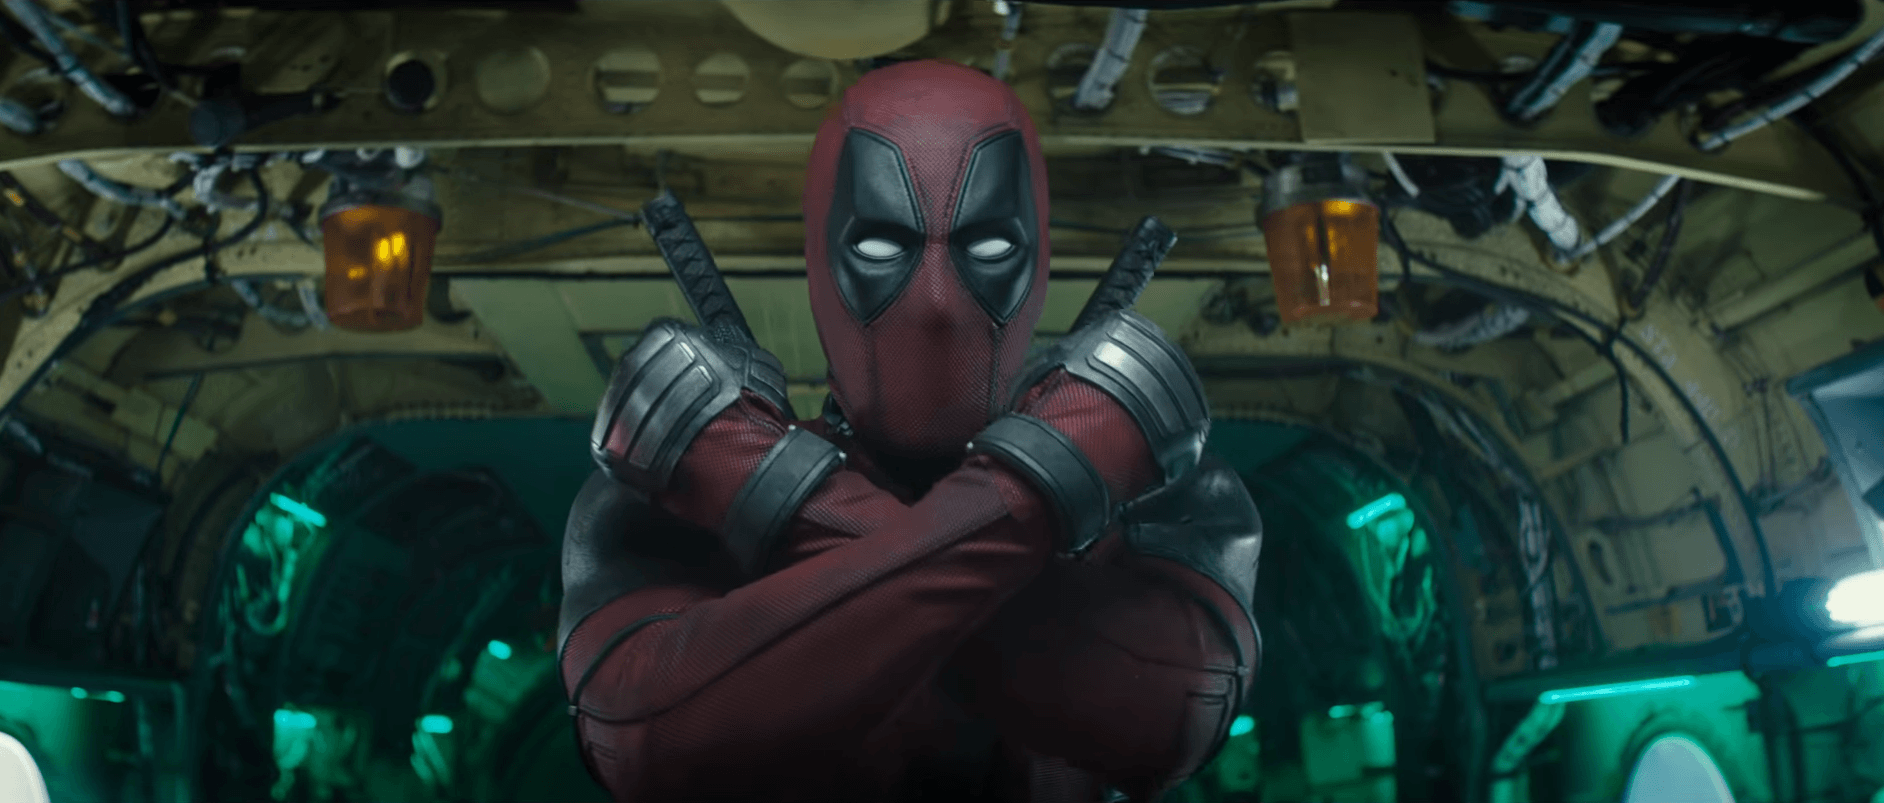 Deadpool 2 2018 Wallpapers Wallpaper Cave